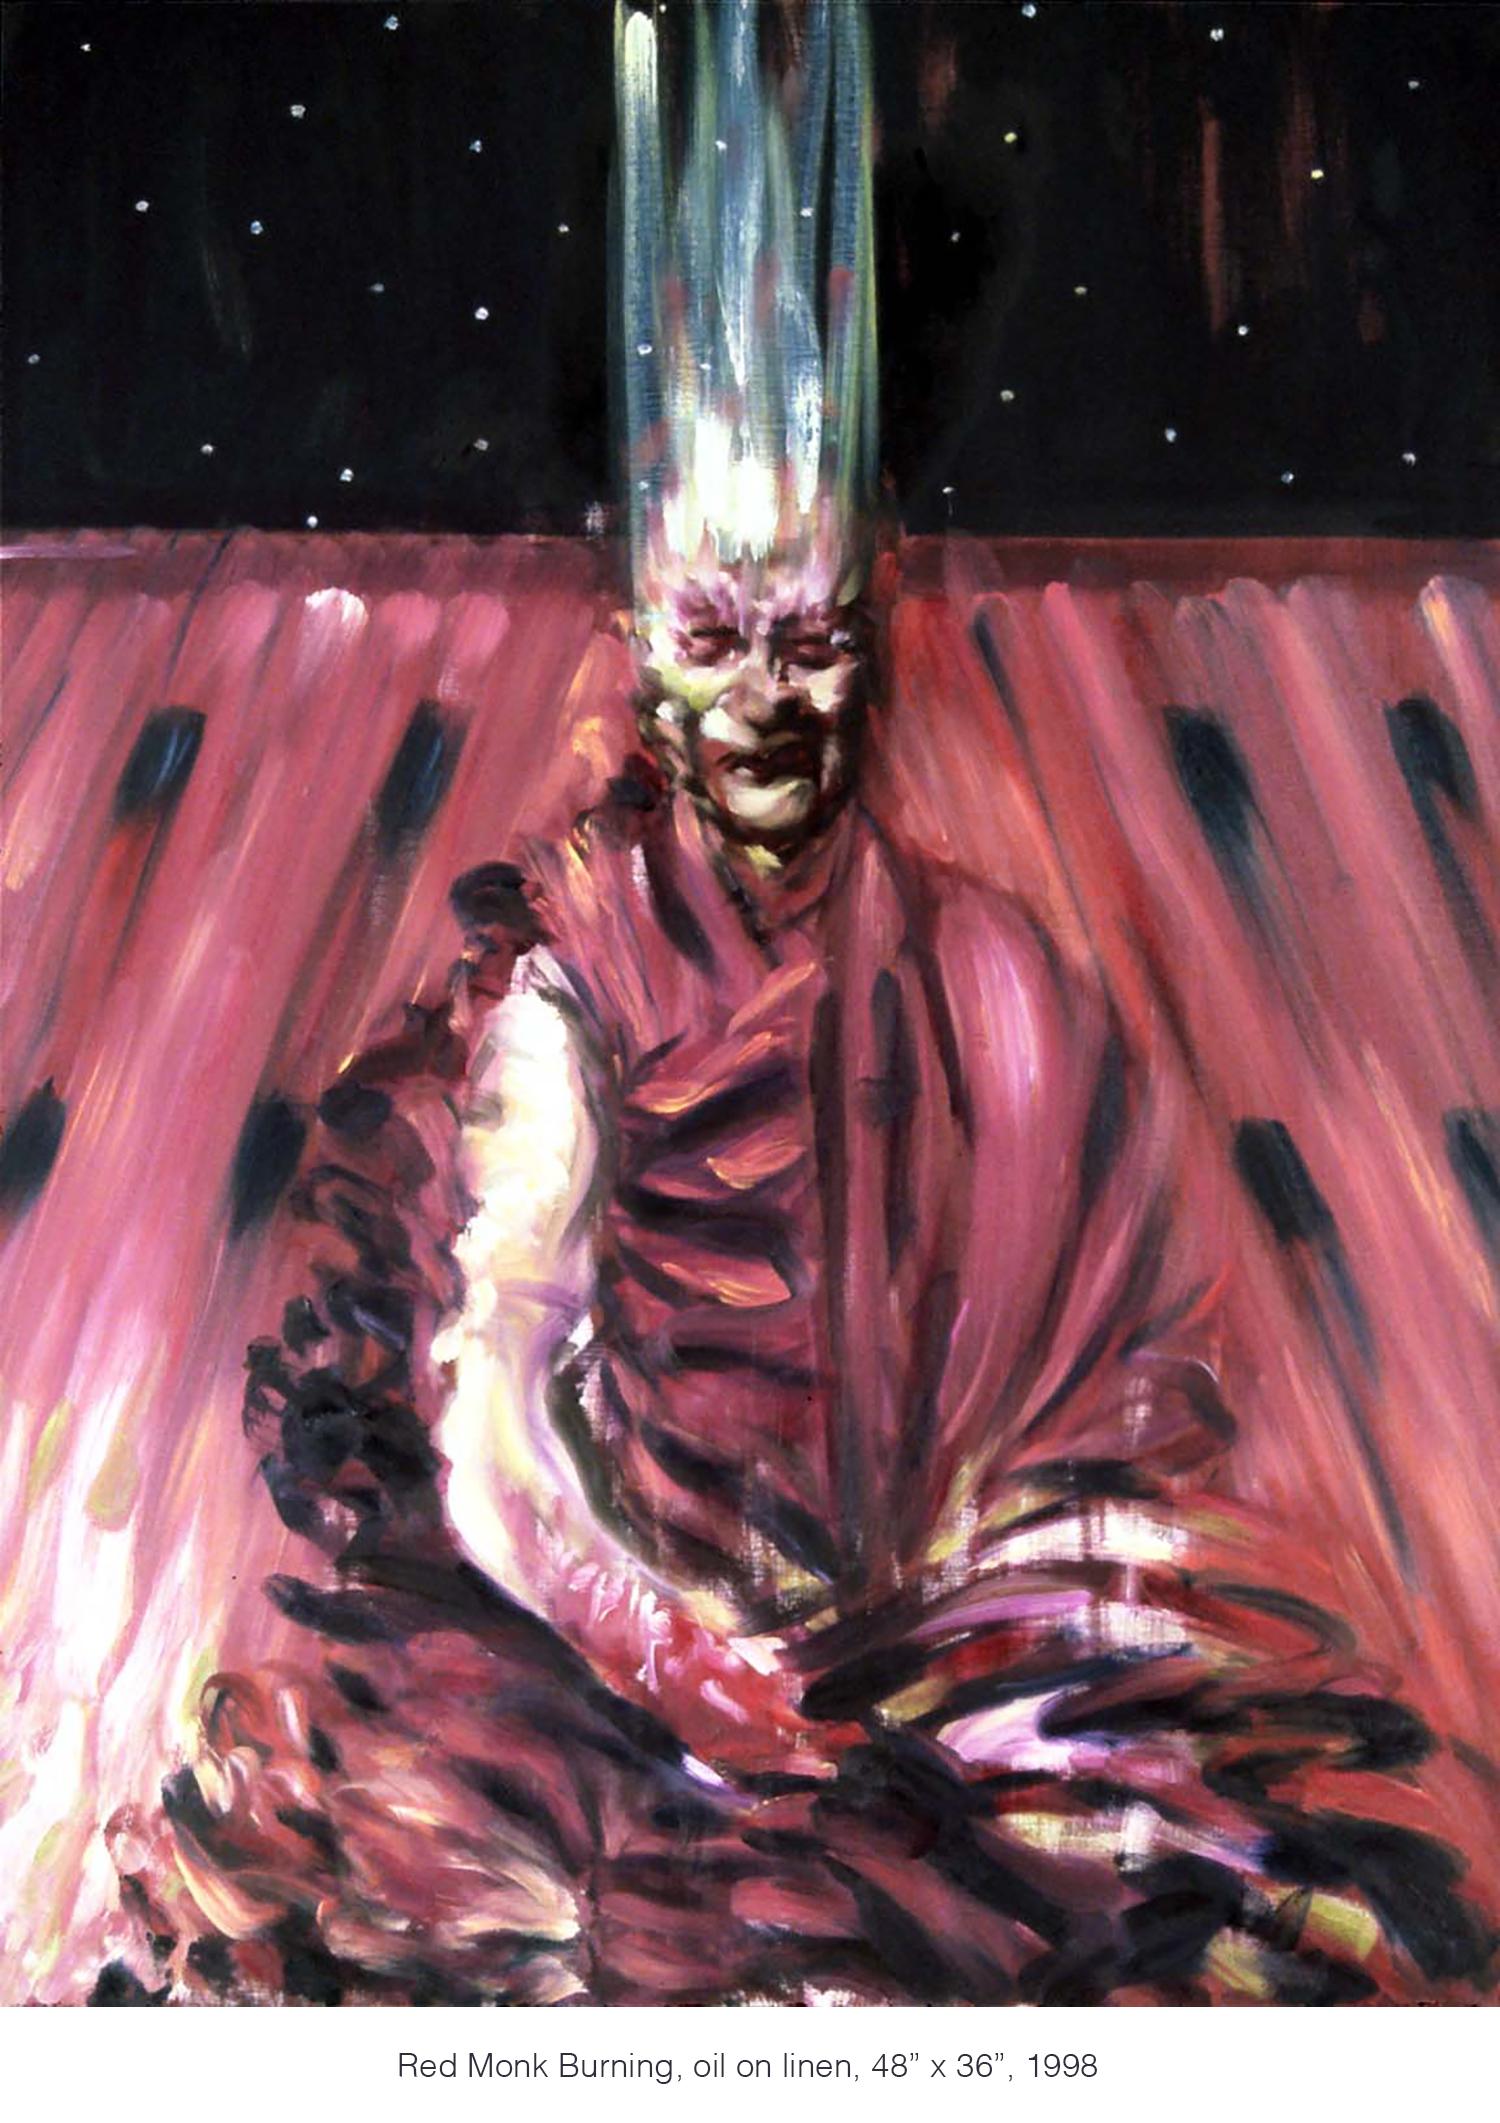 Red Monk Burning_1500.jpg